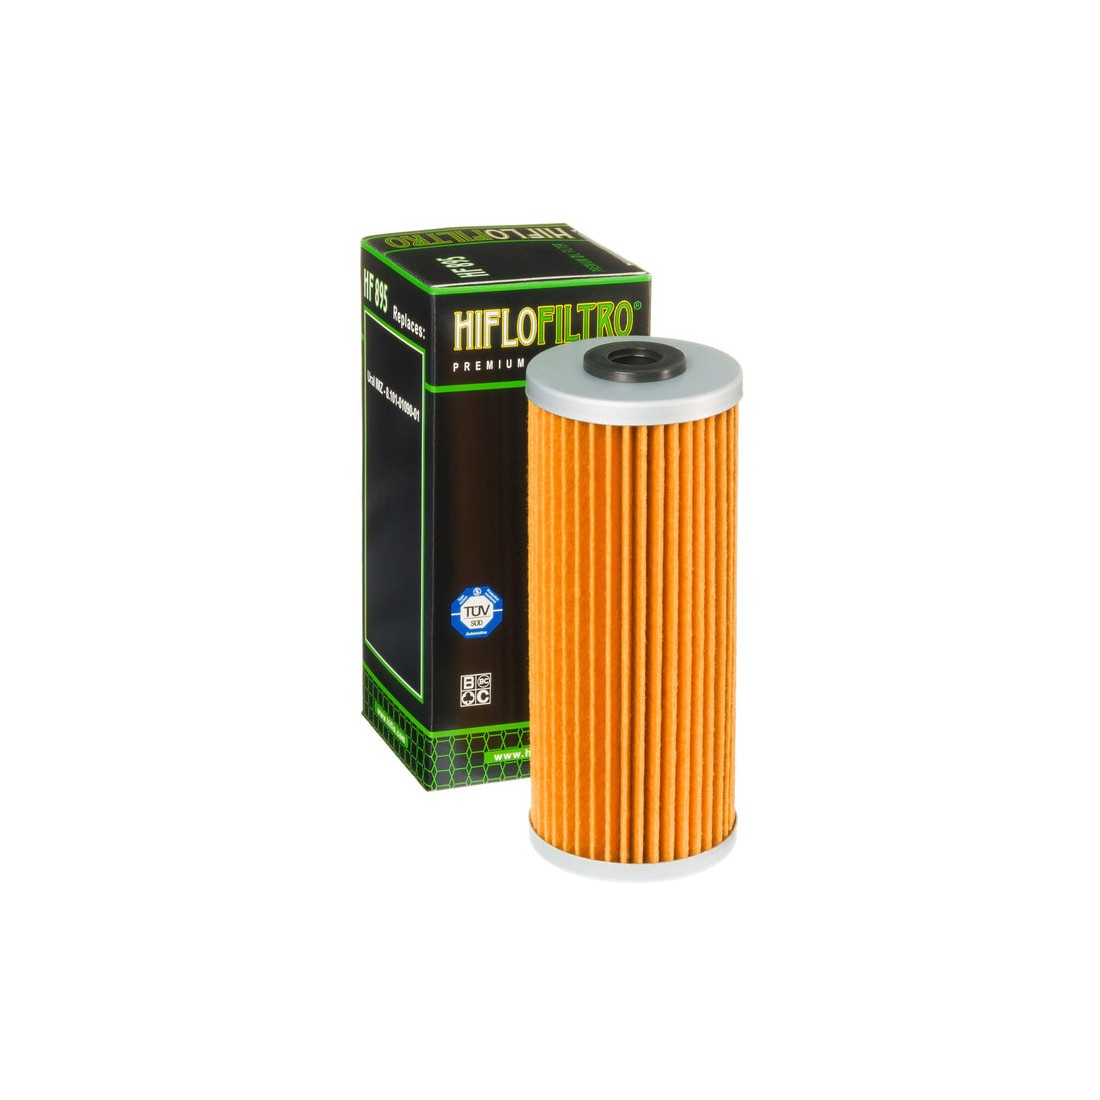 Filtro Aceite Hiflofiltro HF895